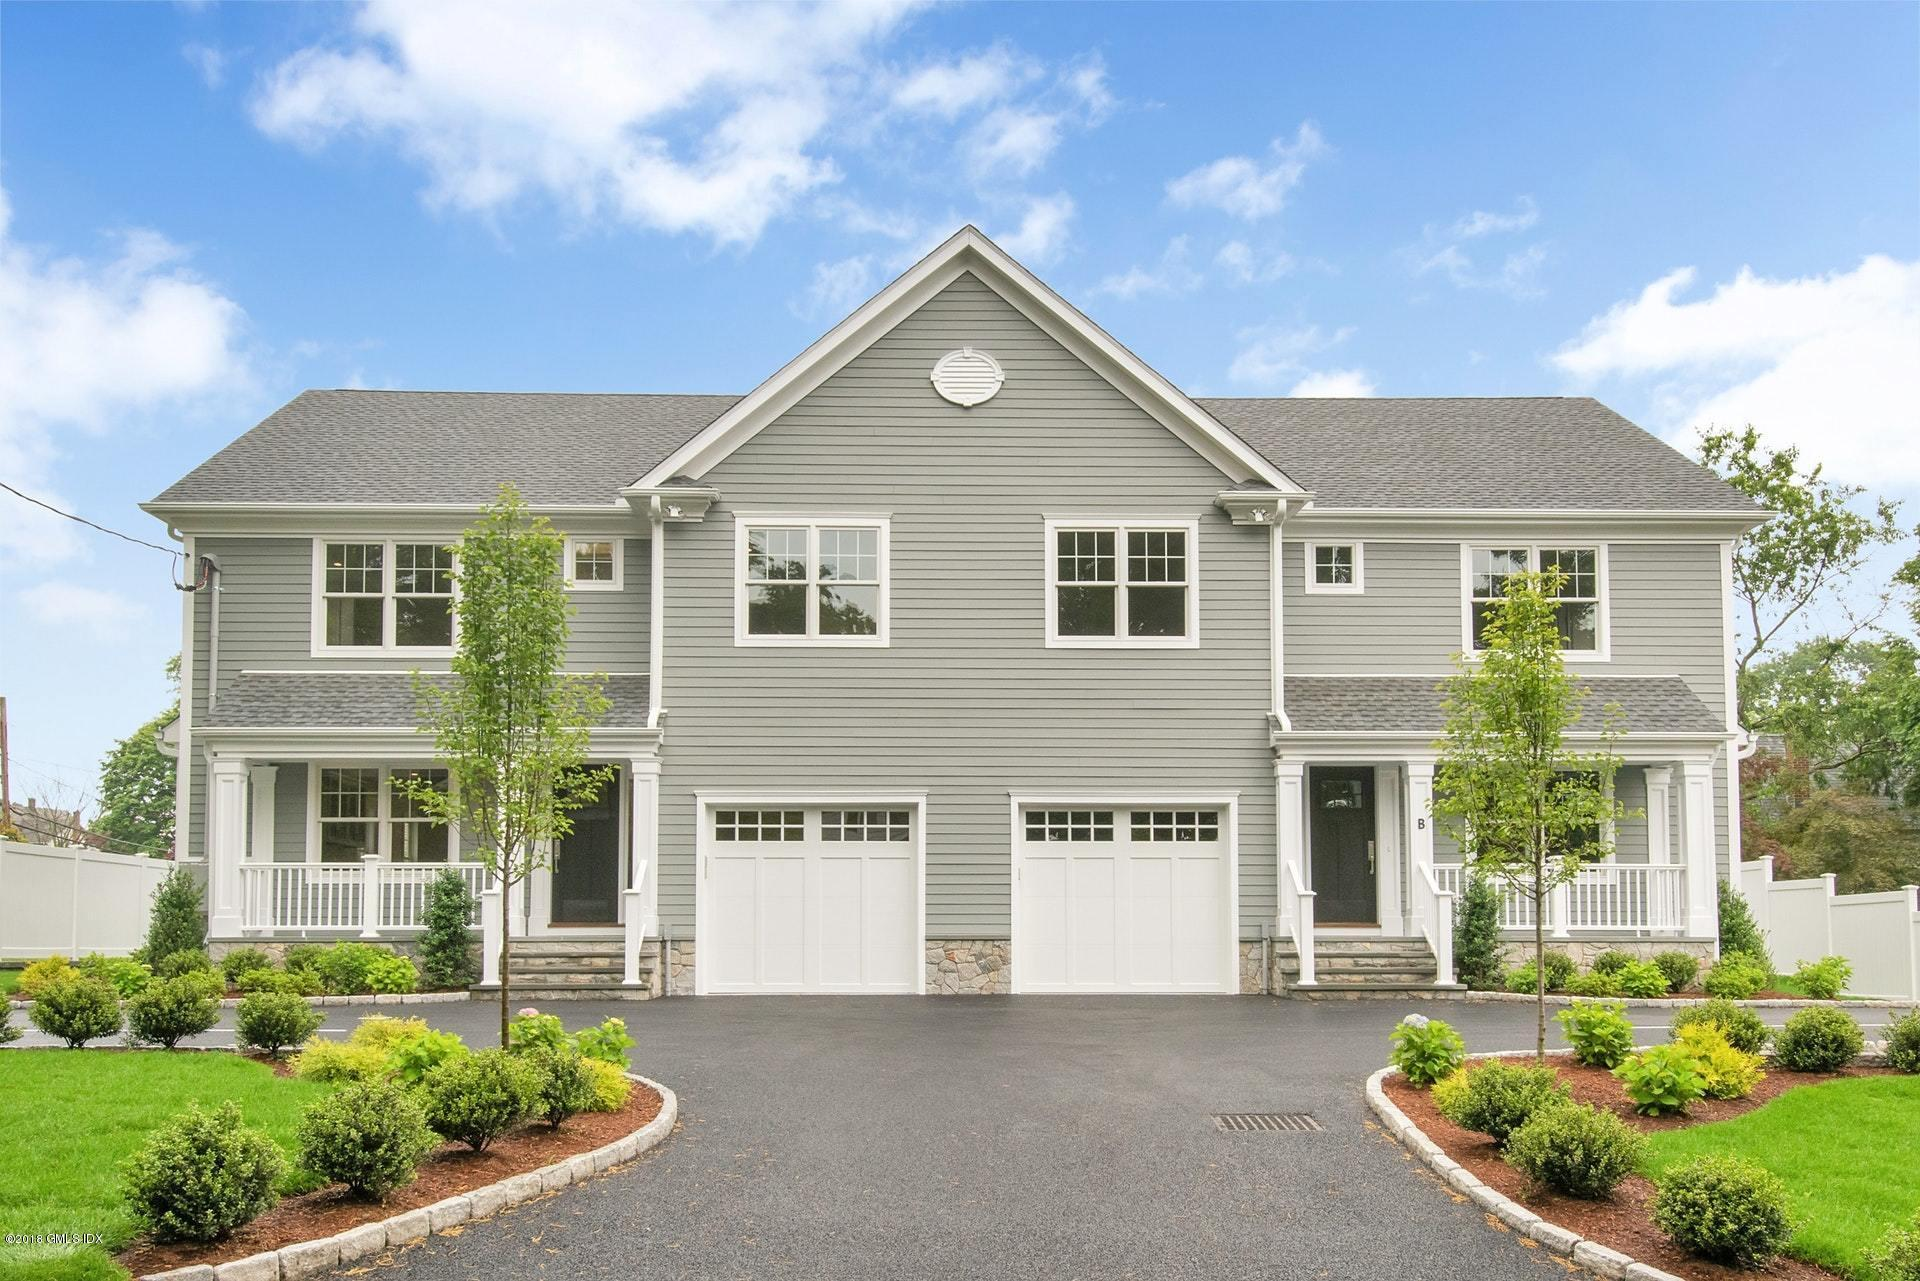 36 Almira Drive,Greenwich,Connecticut 06831,4 Bedrooms Bedrooms,3 BathroomsBathrooms,Condominium,Almira,105233